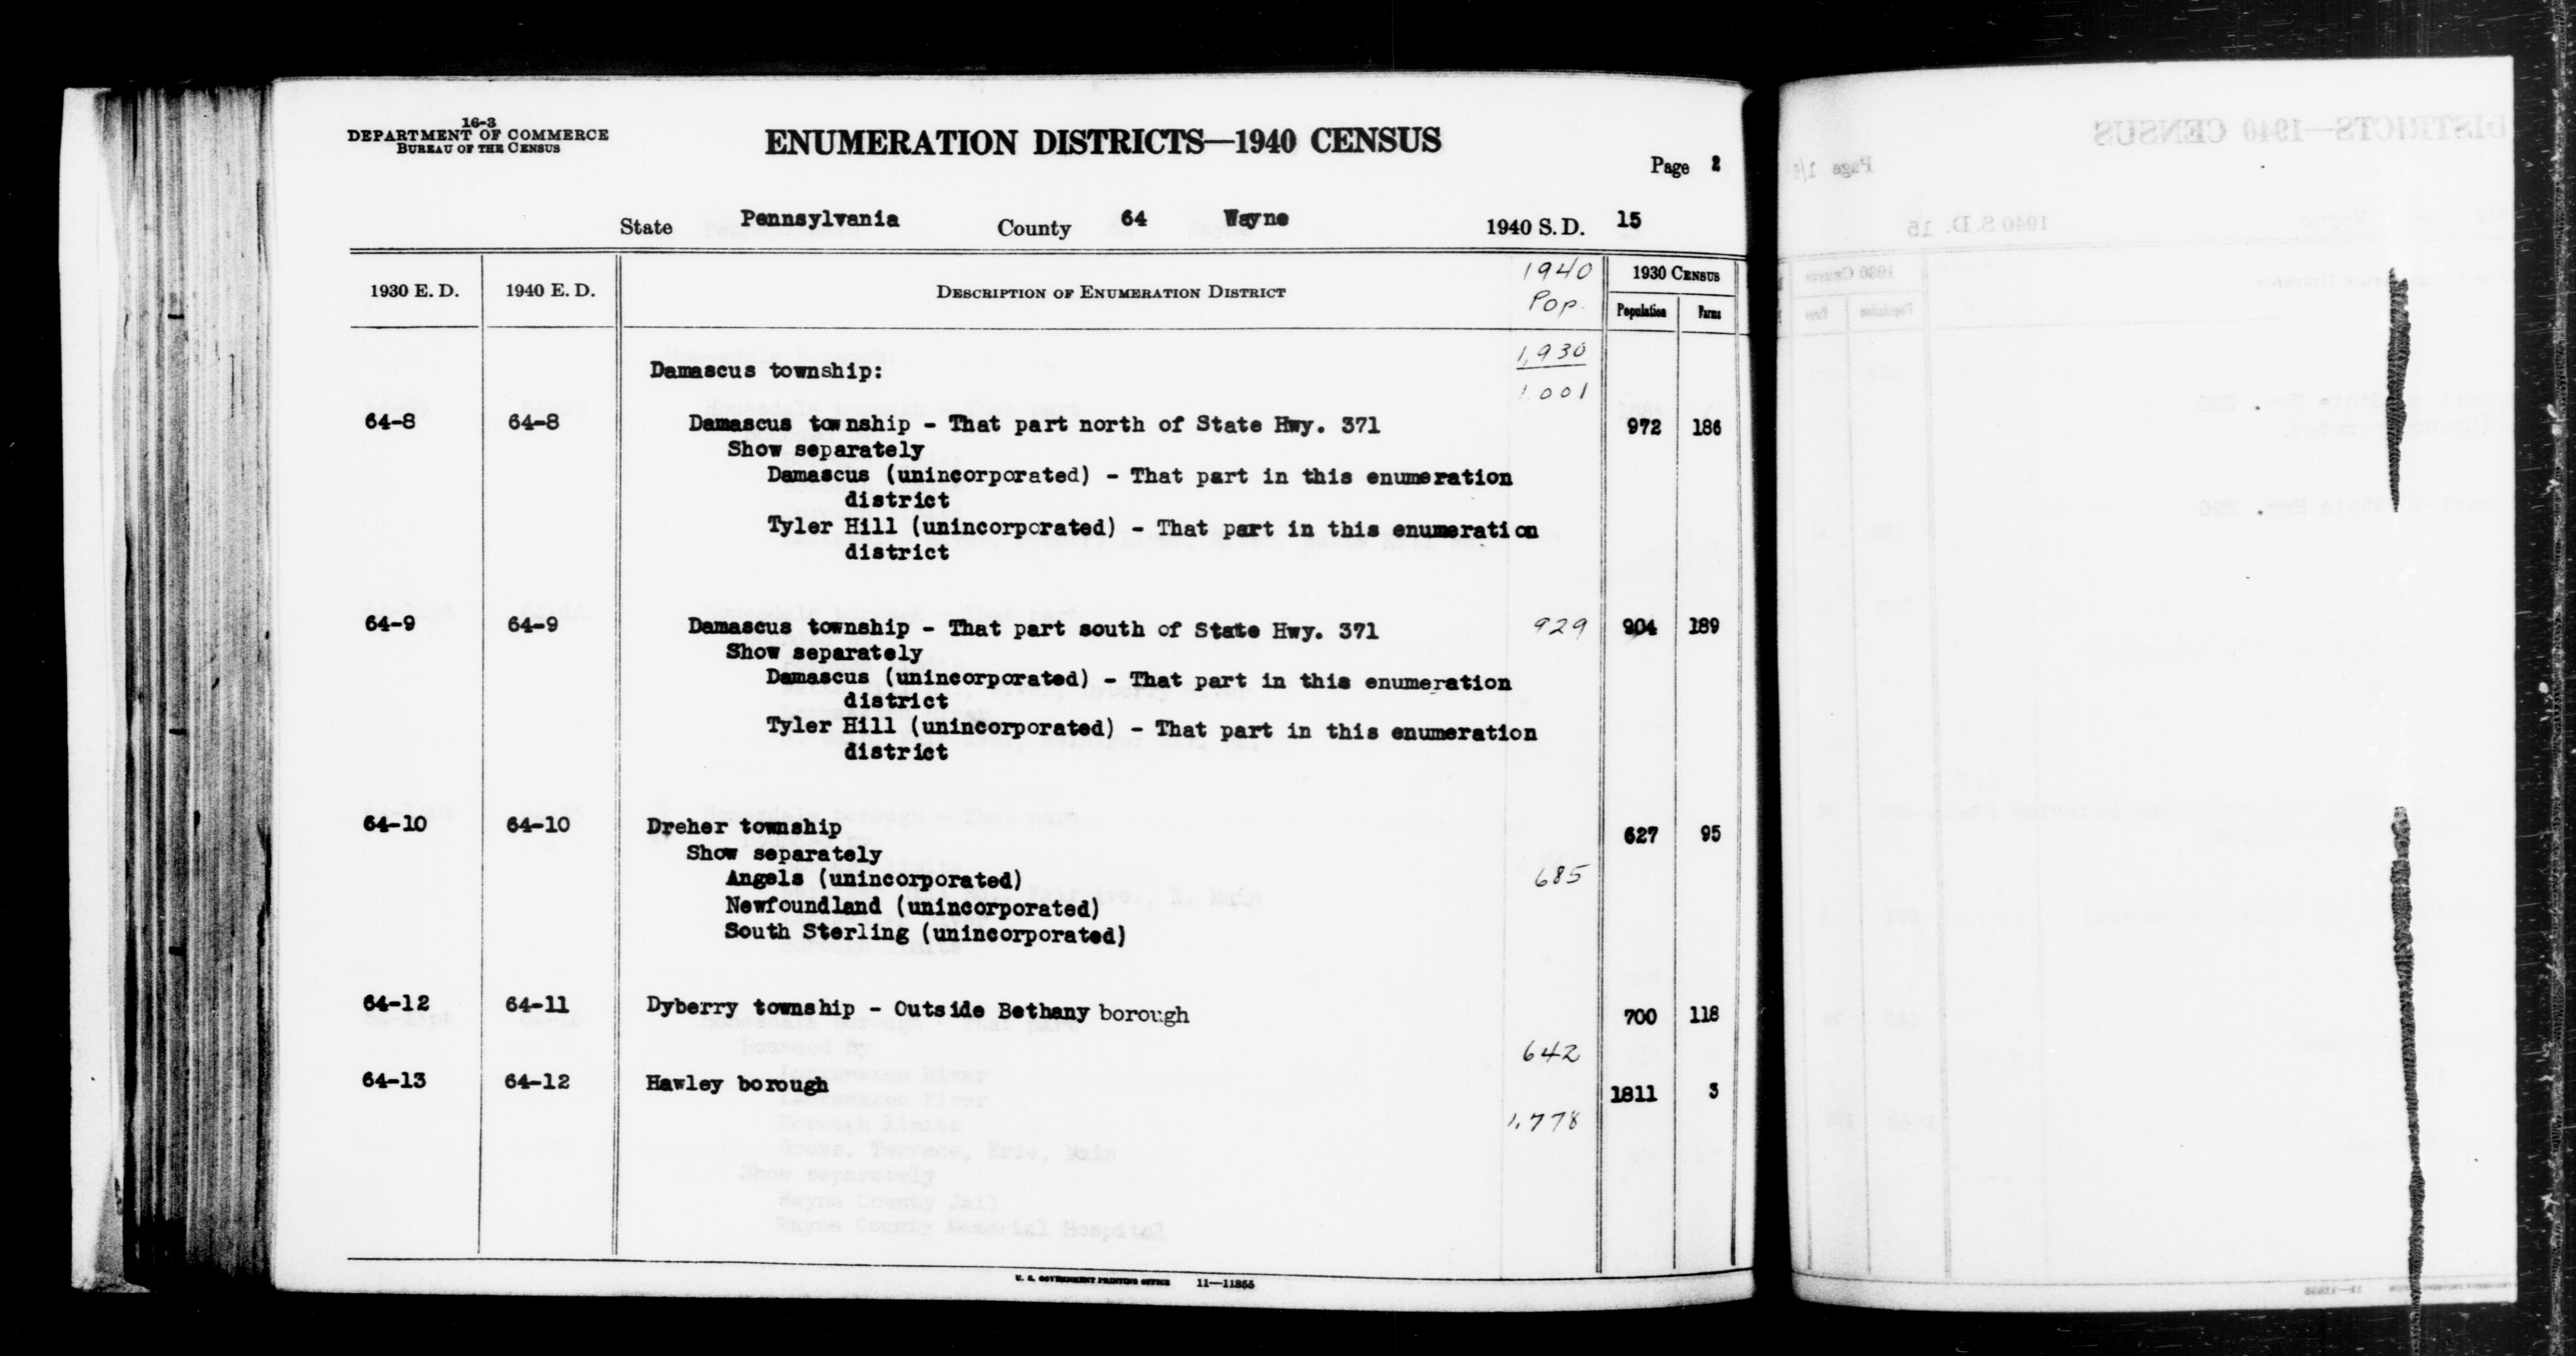 1940 Census Enumeration District Descriptions - Pennsylvania - Wayne County - ED 64-8, ED 64-9, ED 64-10, ED 64-11, ED 64-12